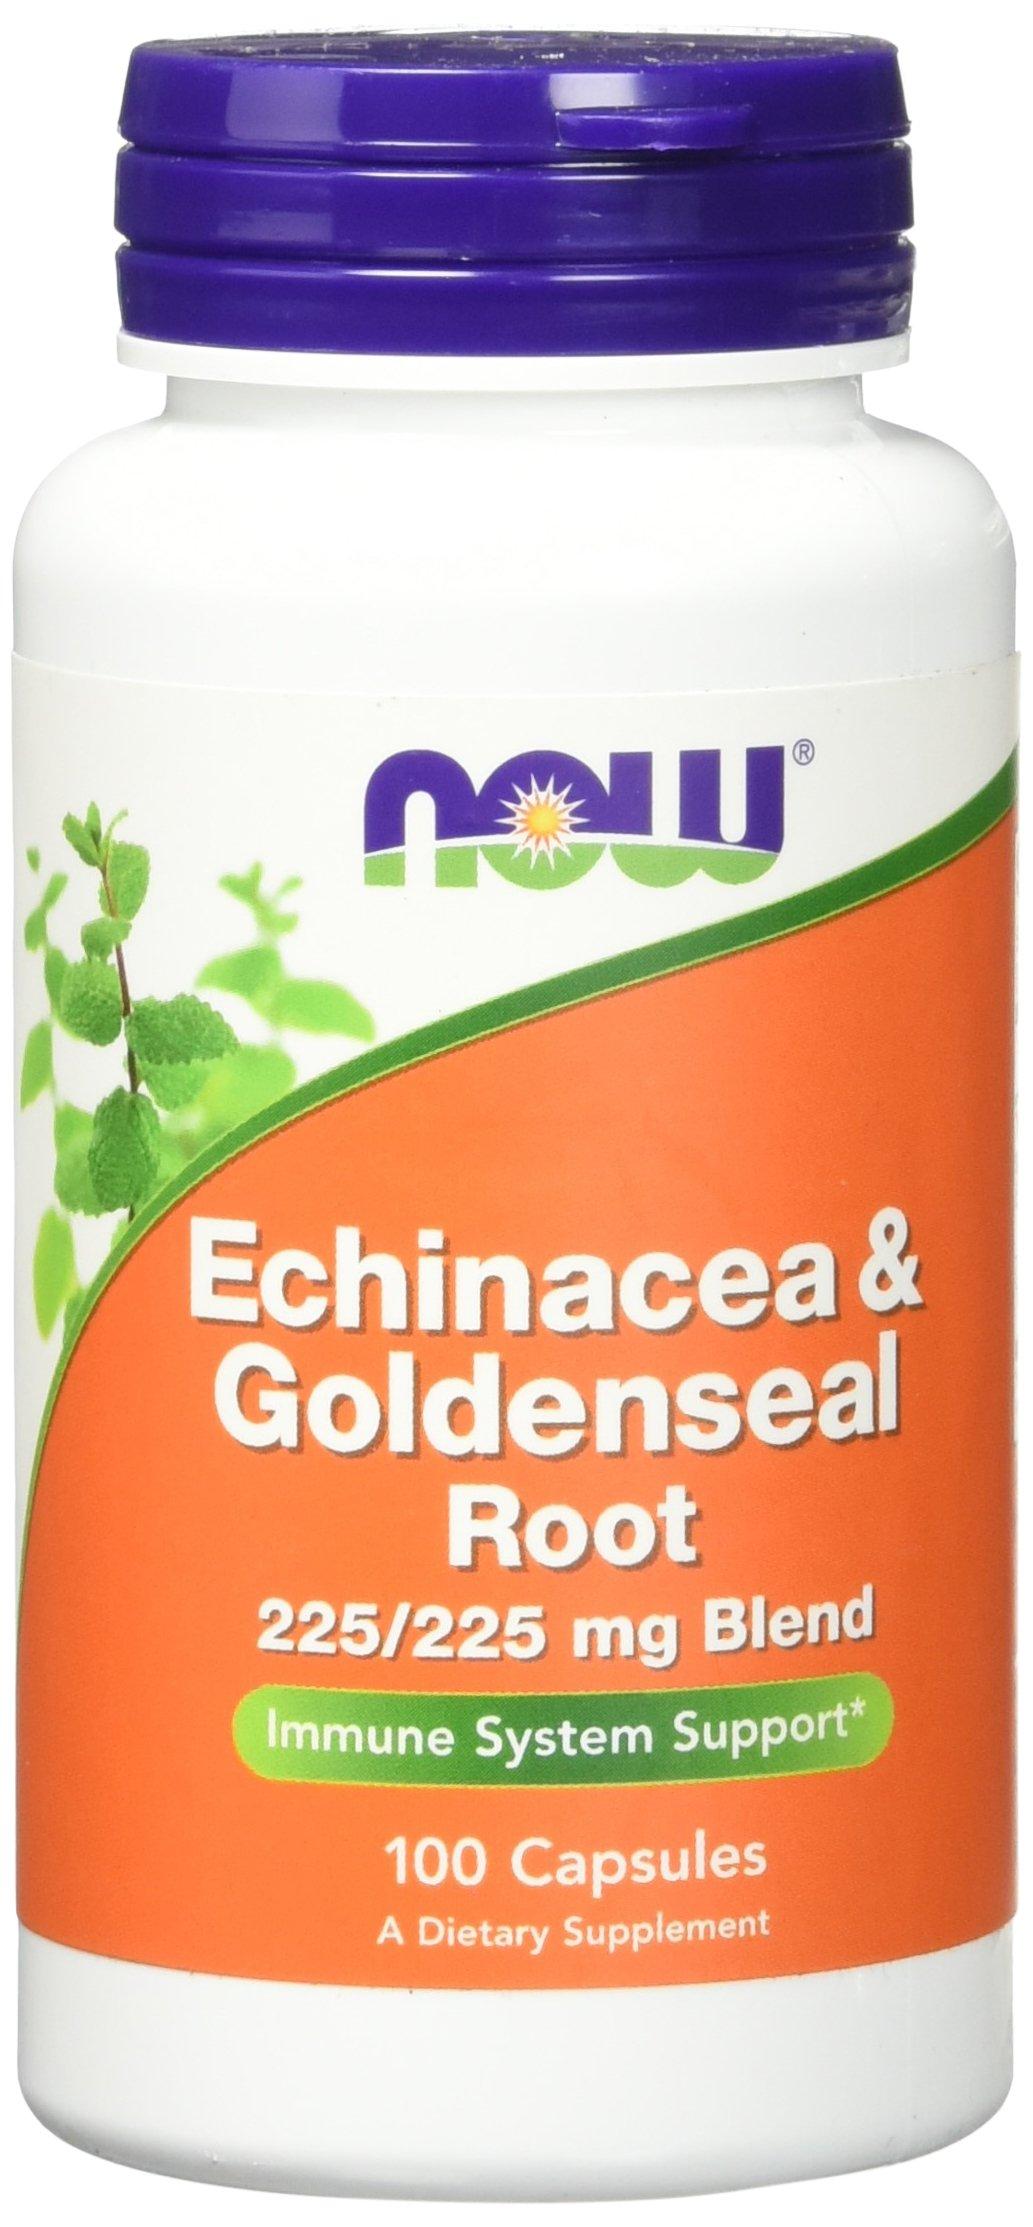 NOW Echinacea & Goldenseal Root,100 Capsules